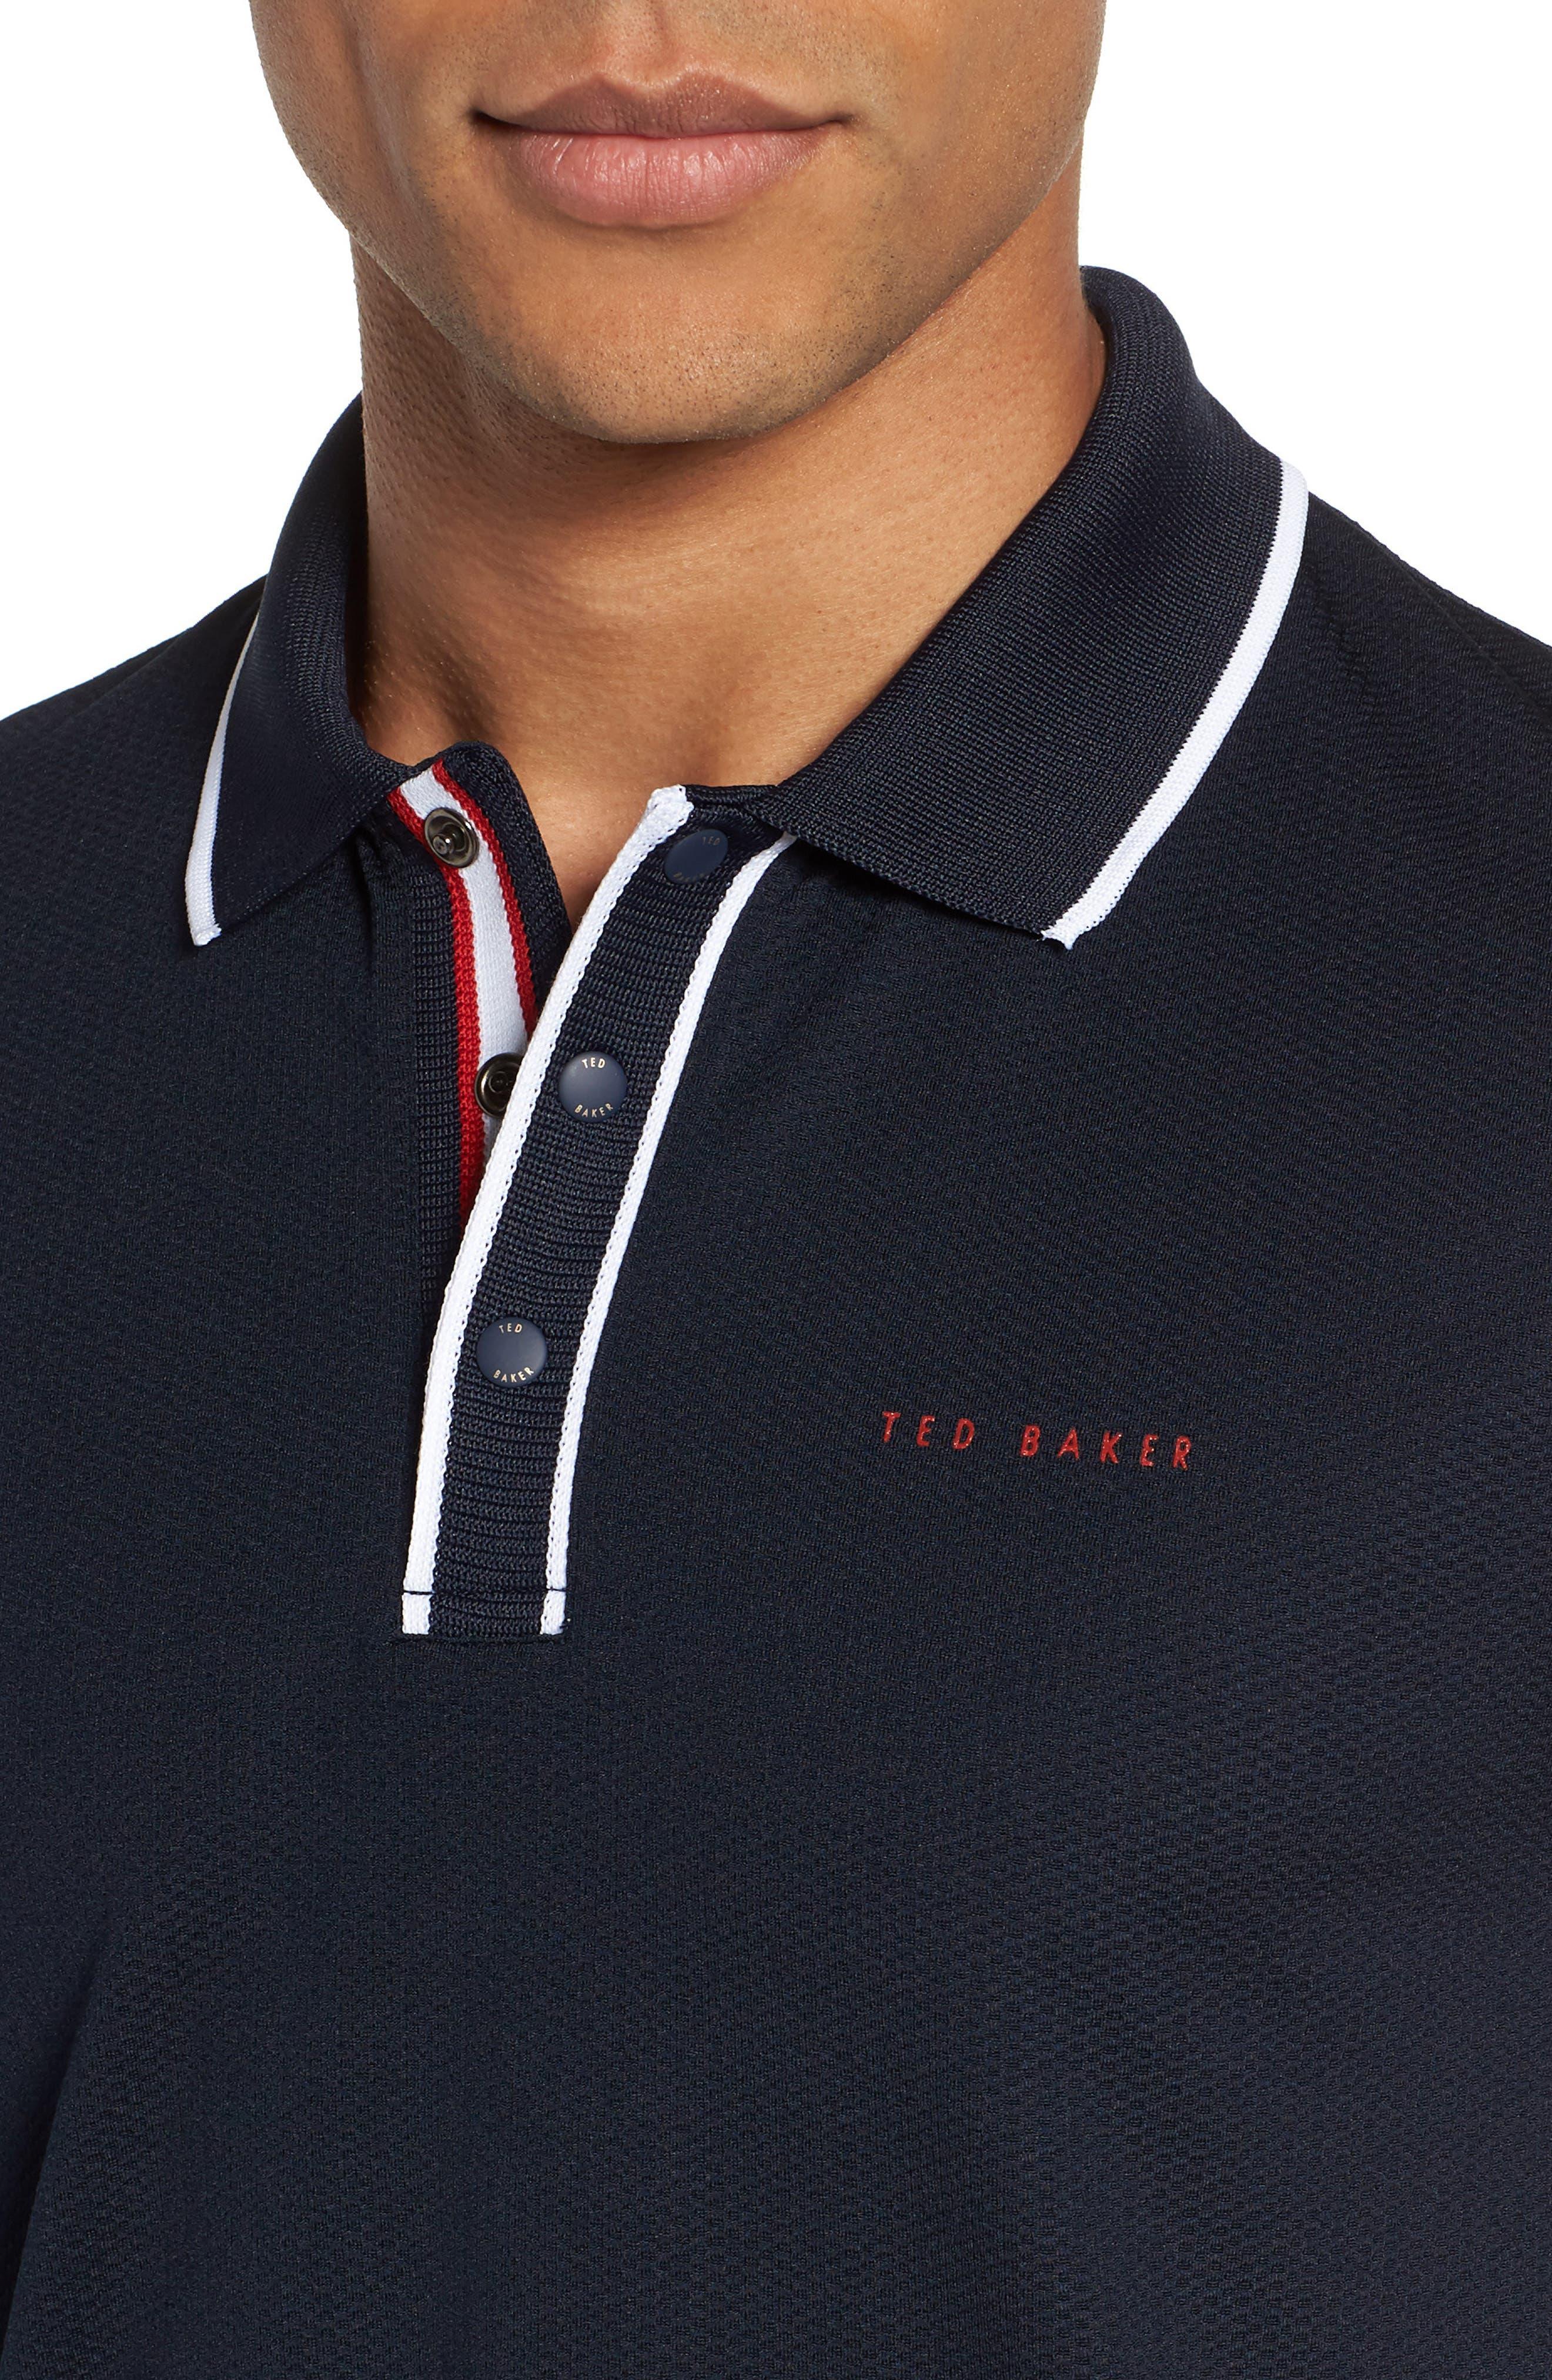 Bunka Trim Fit Golf Polo,                             Alternate thumbnail 4, color,                             NAVY